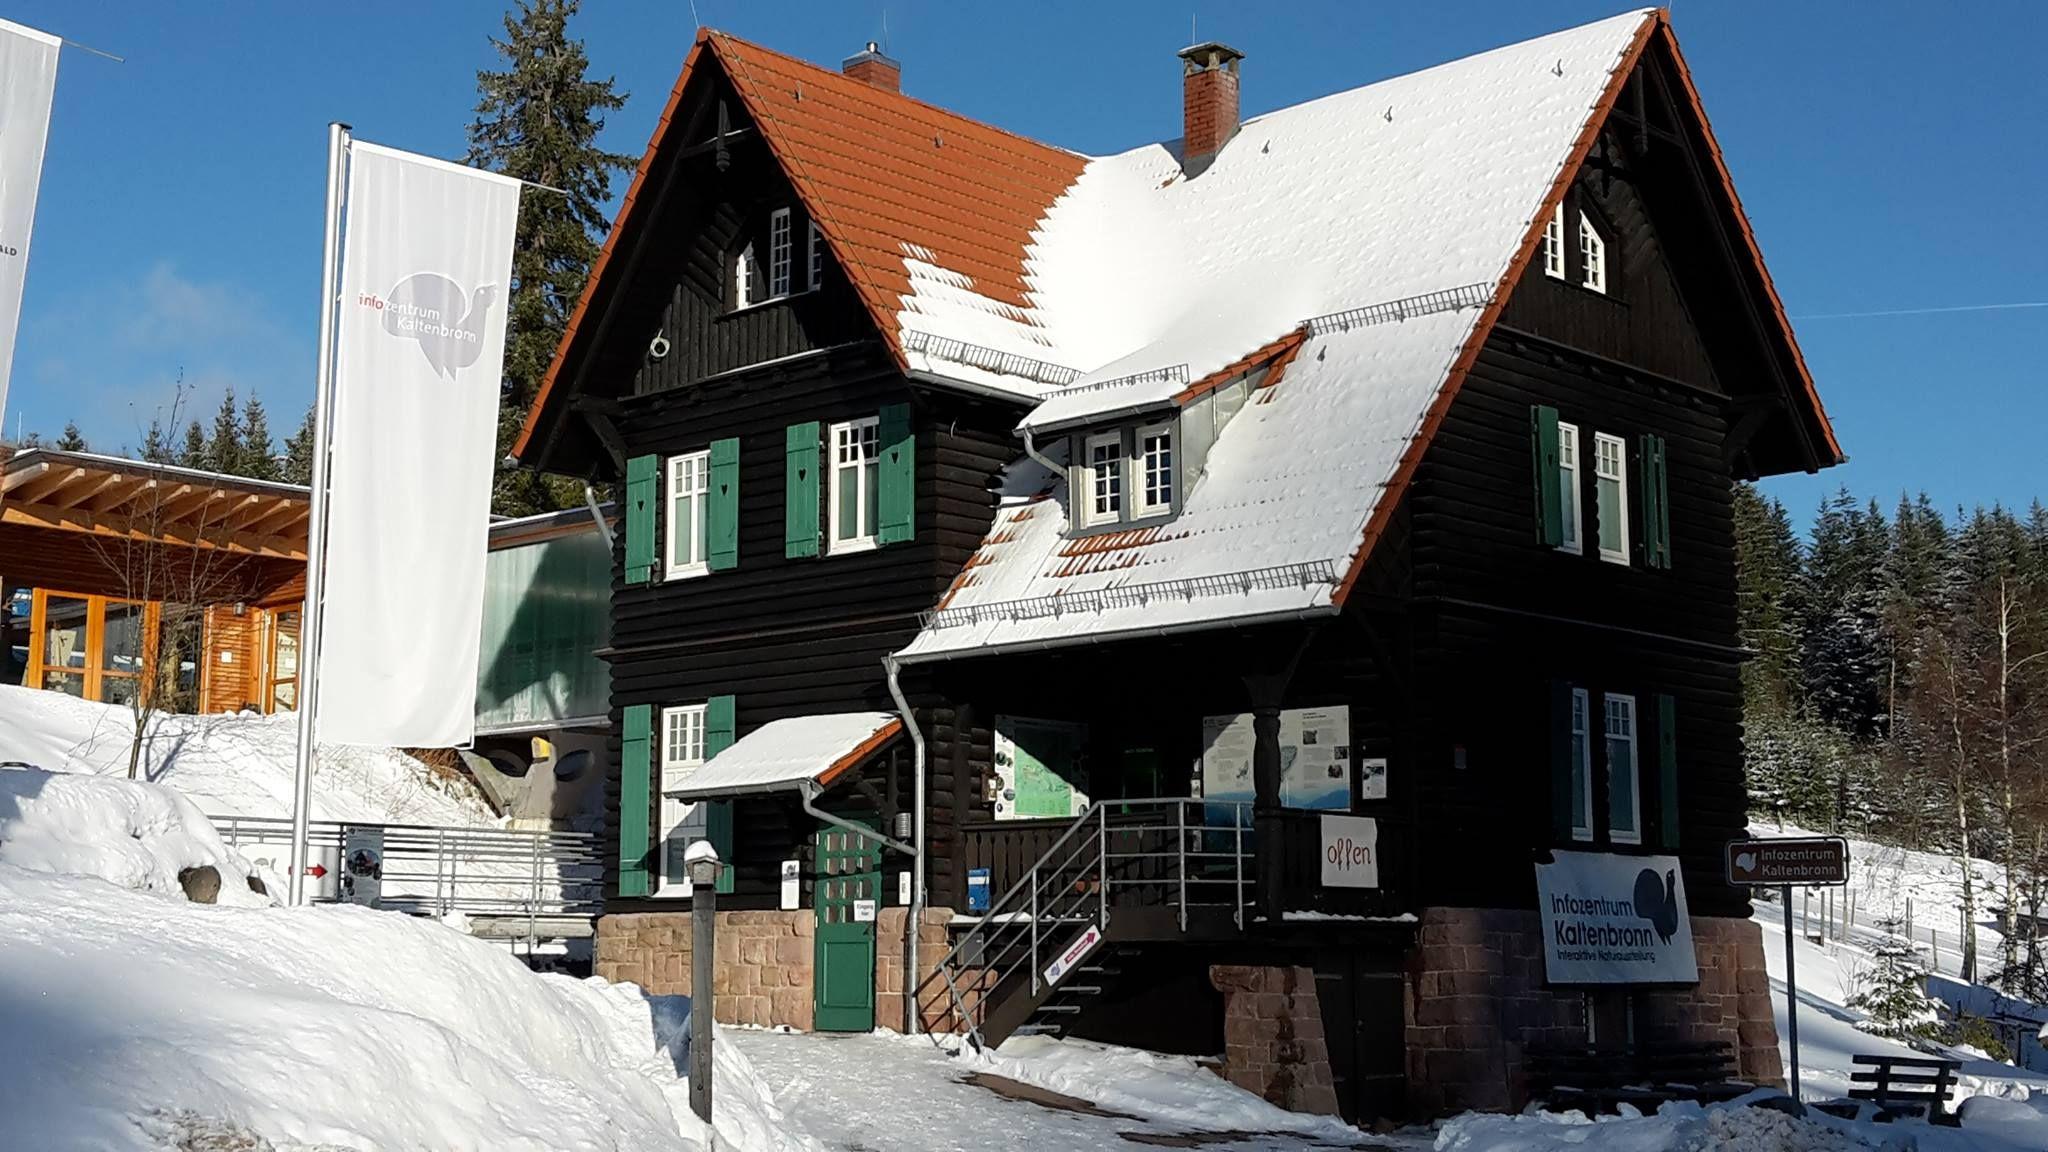 IZ_Gebäude_Winter